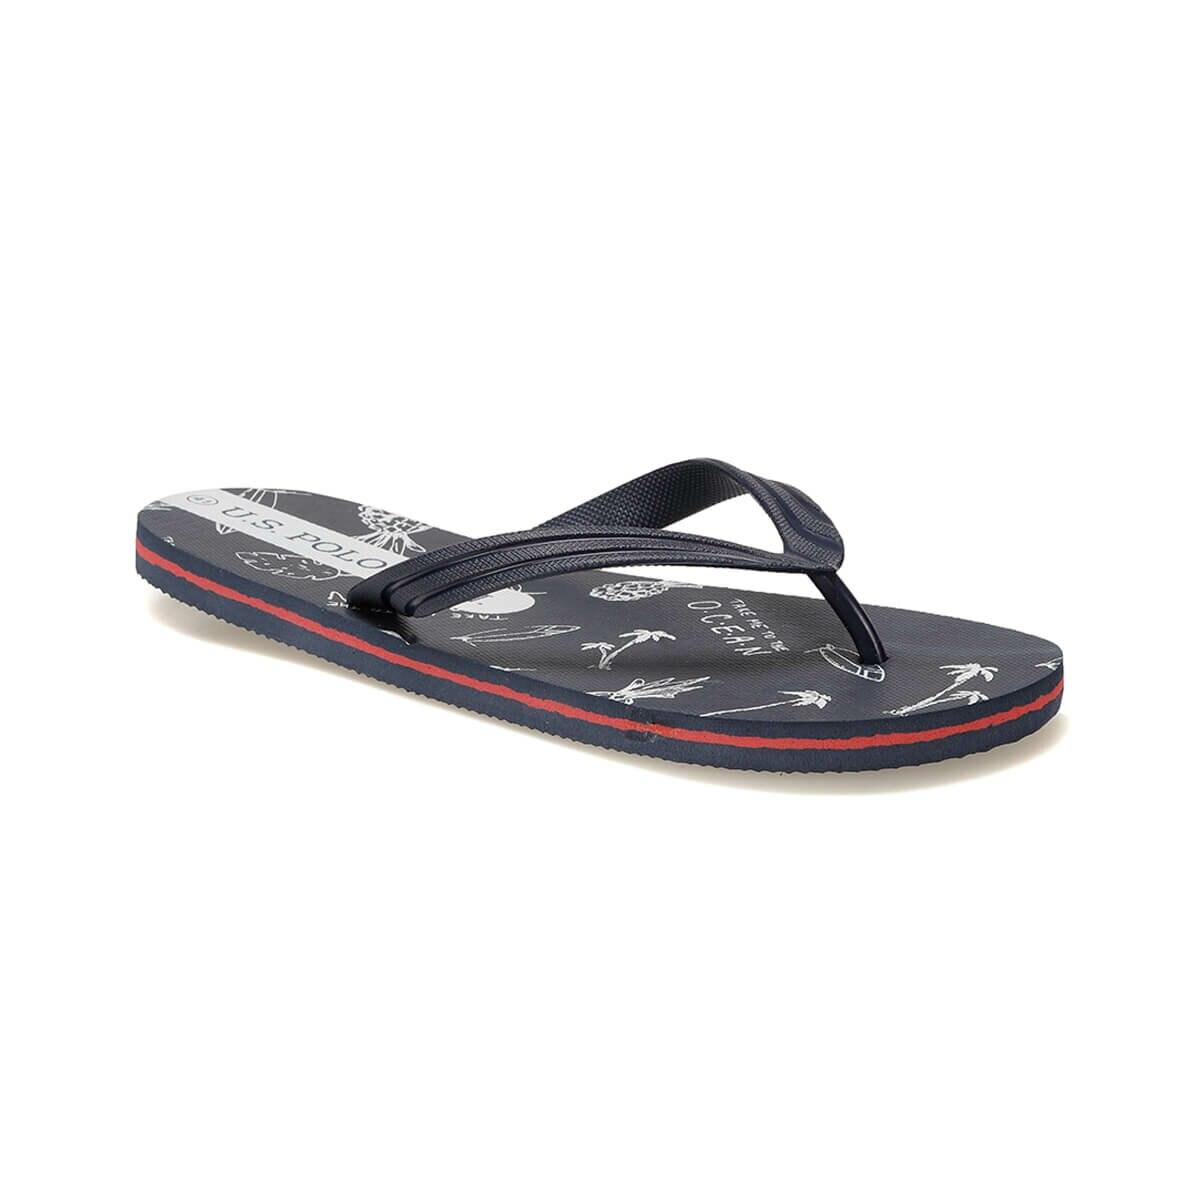 FLO NERO Black Male Slippers U.S. POLO ASSN.